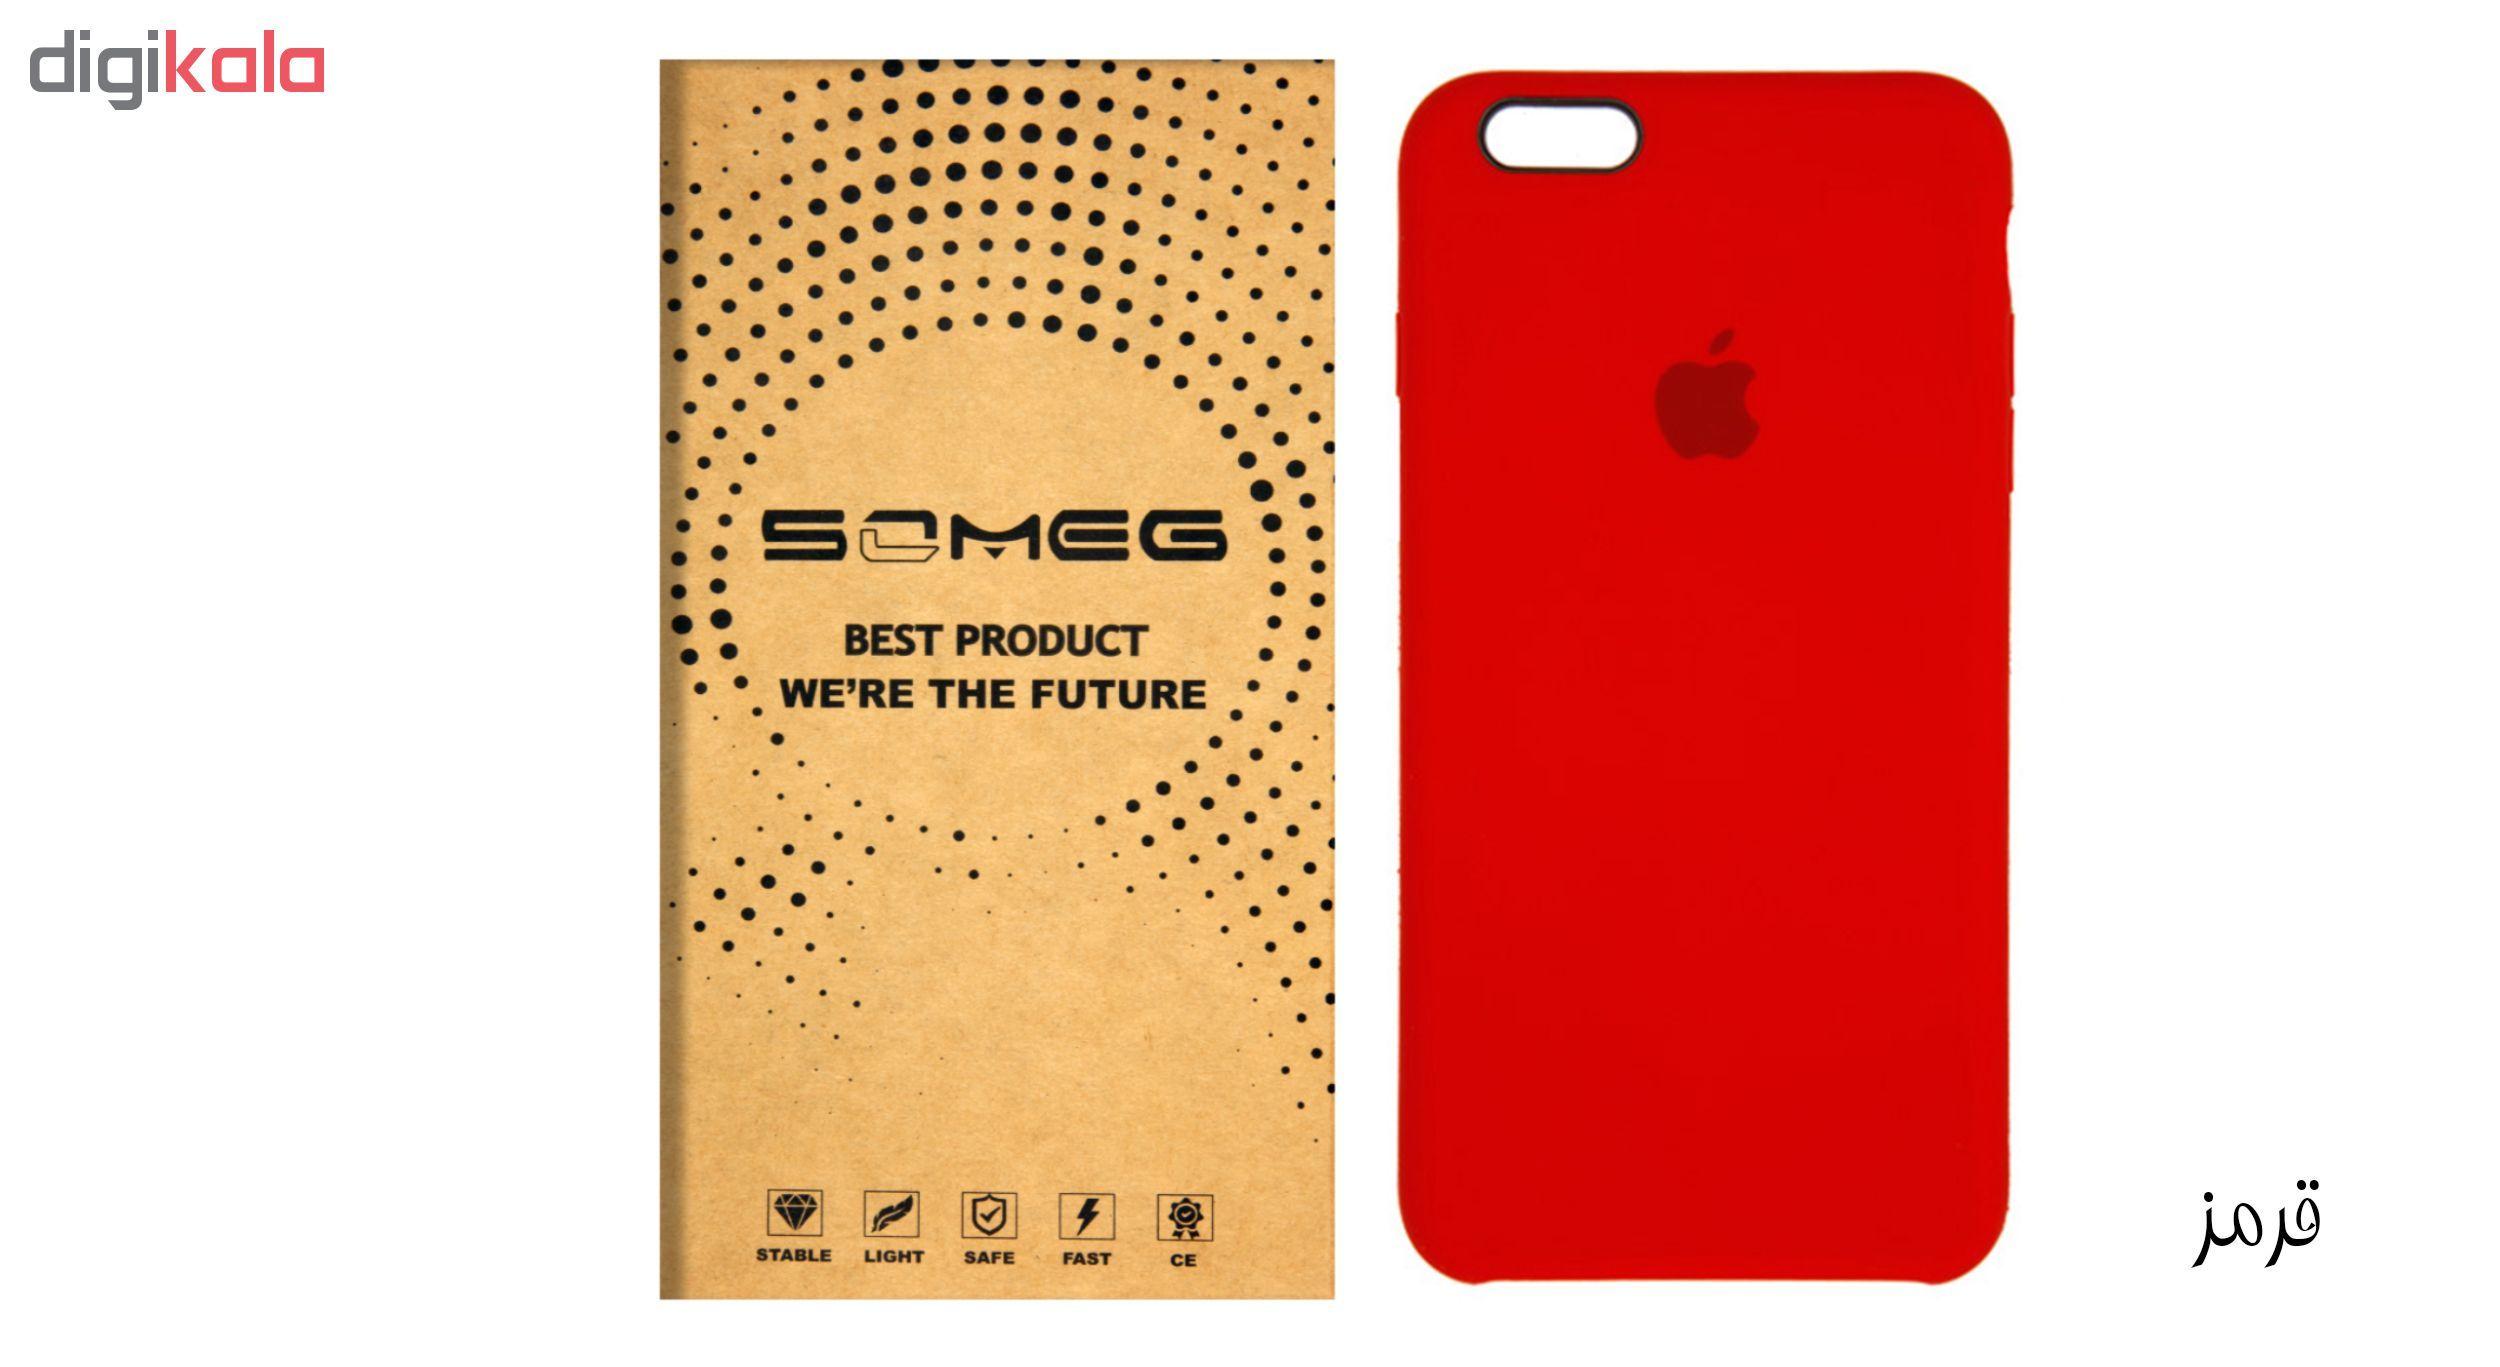 کاور سومگ مدل SIC مناسب برای گوشی موبایل اپل iPhone 6/6s main 1 23